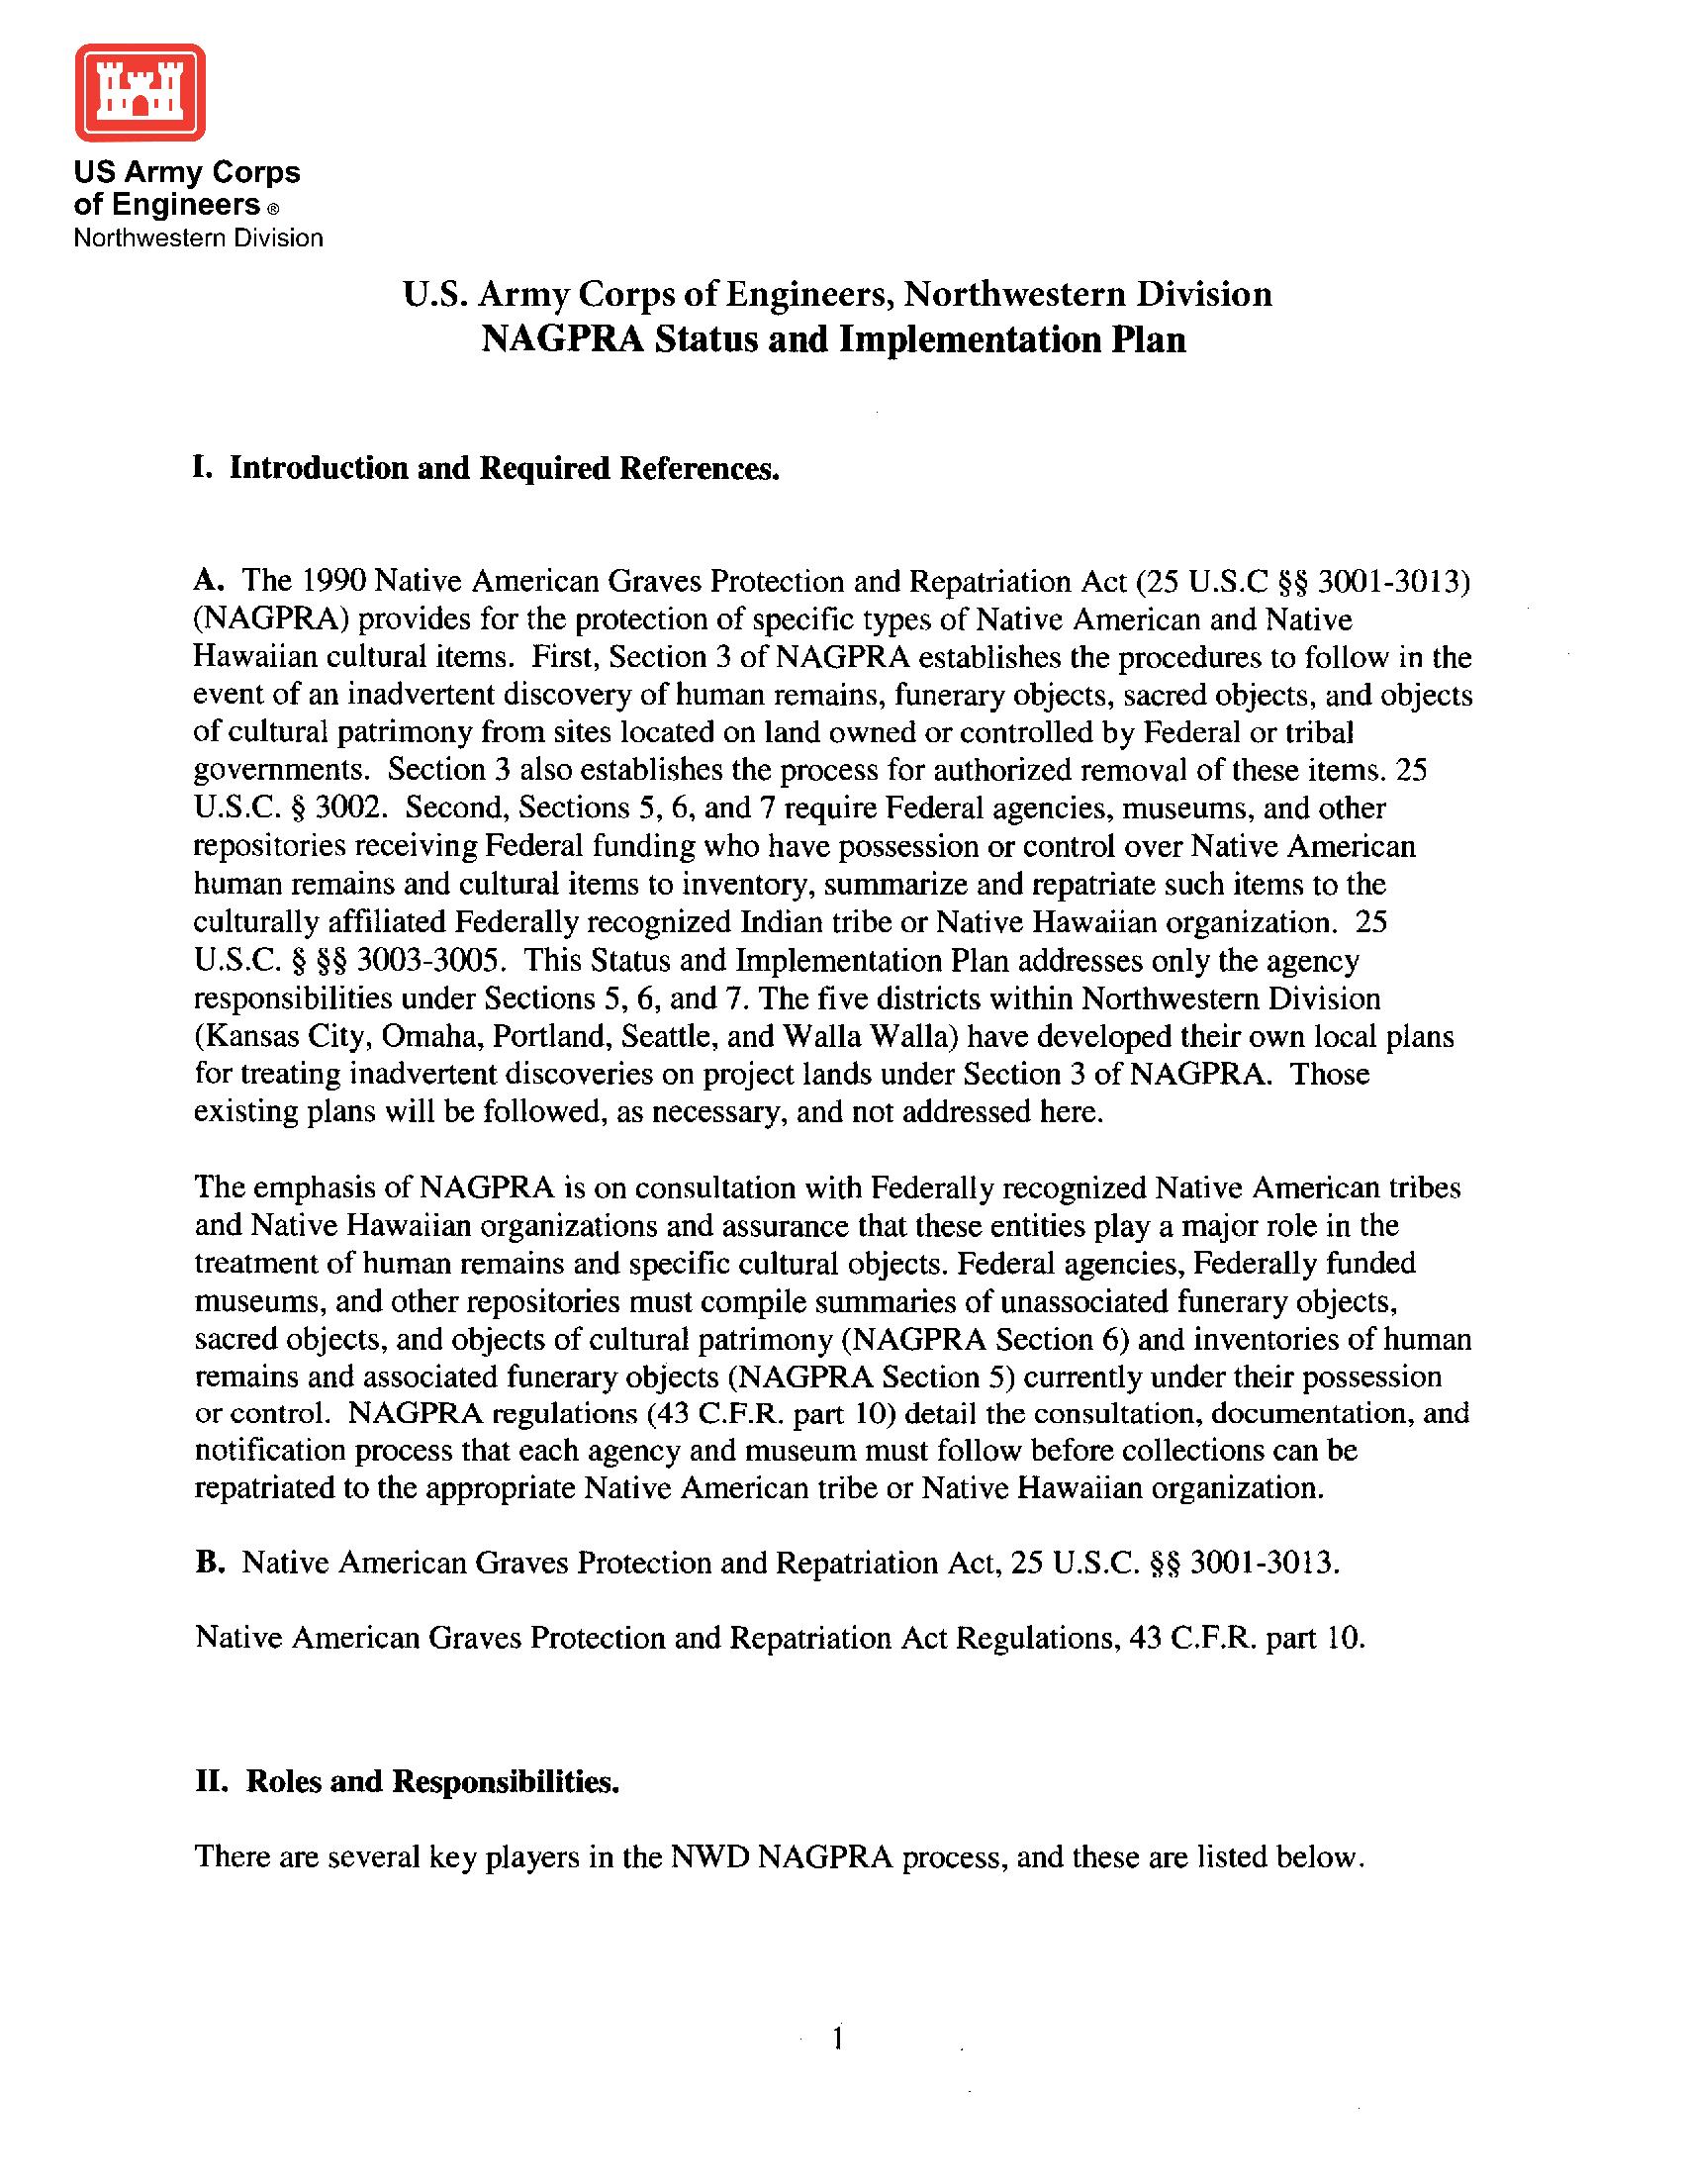 NAGPRA status and implementation plan - Booklets, Manuals